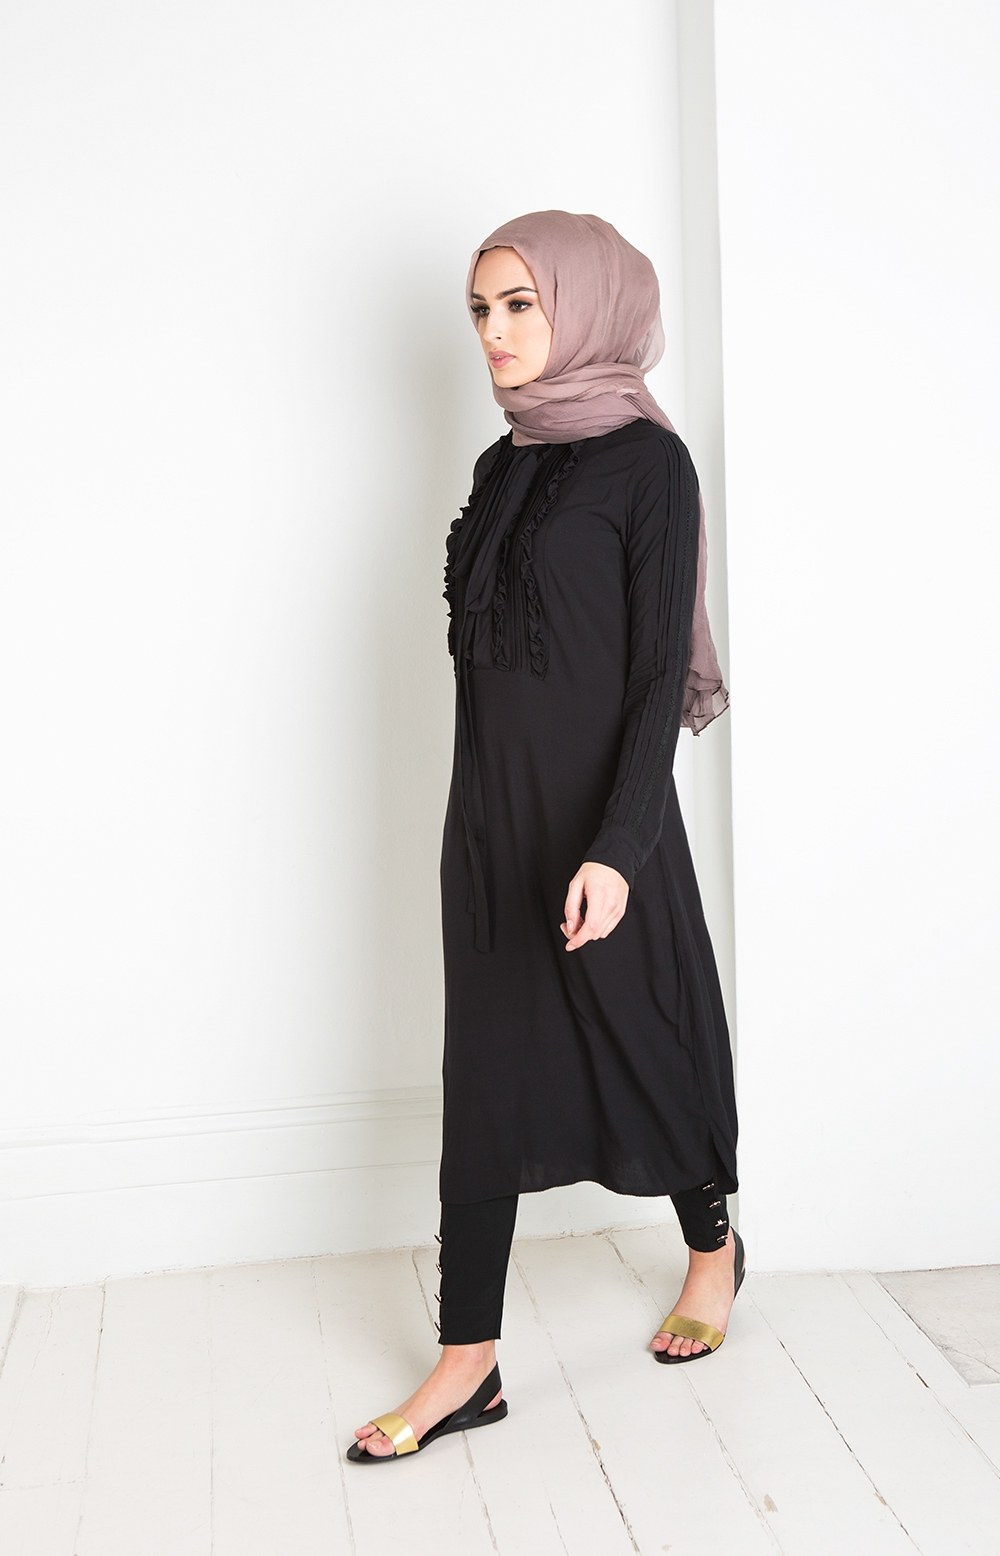 Inspirasi Style Baju Lebaran Y7du 25 Trend Model Baju Muslim Lebaran 2017 Simple Modis